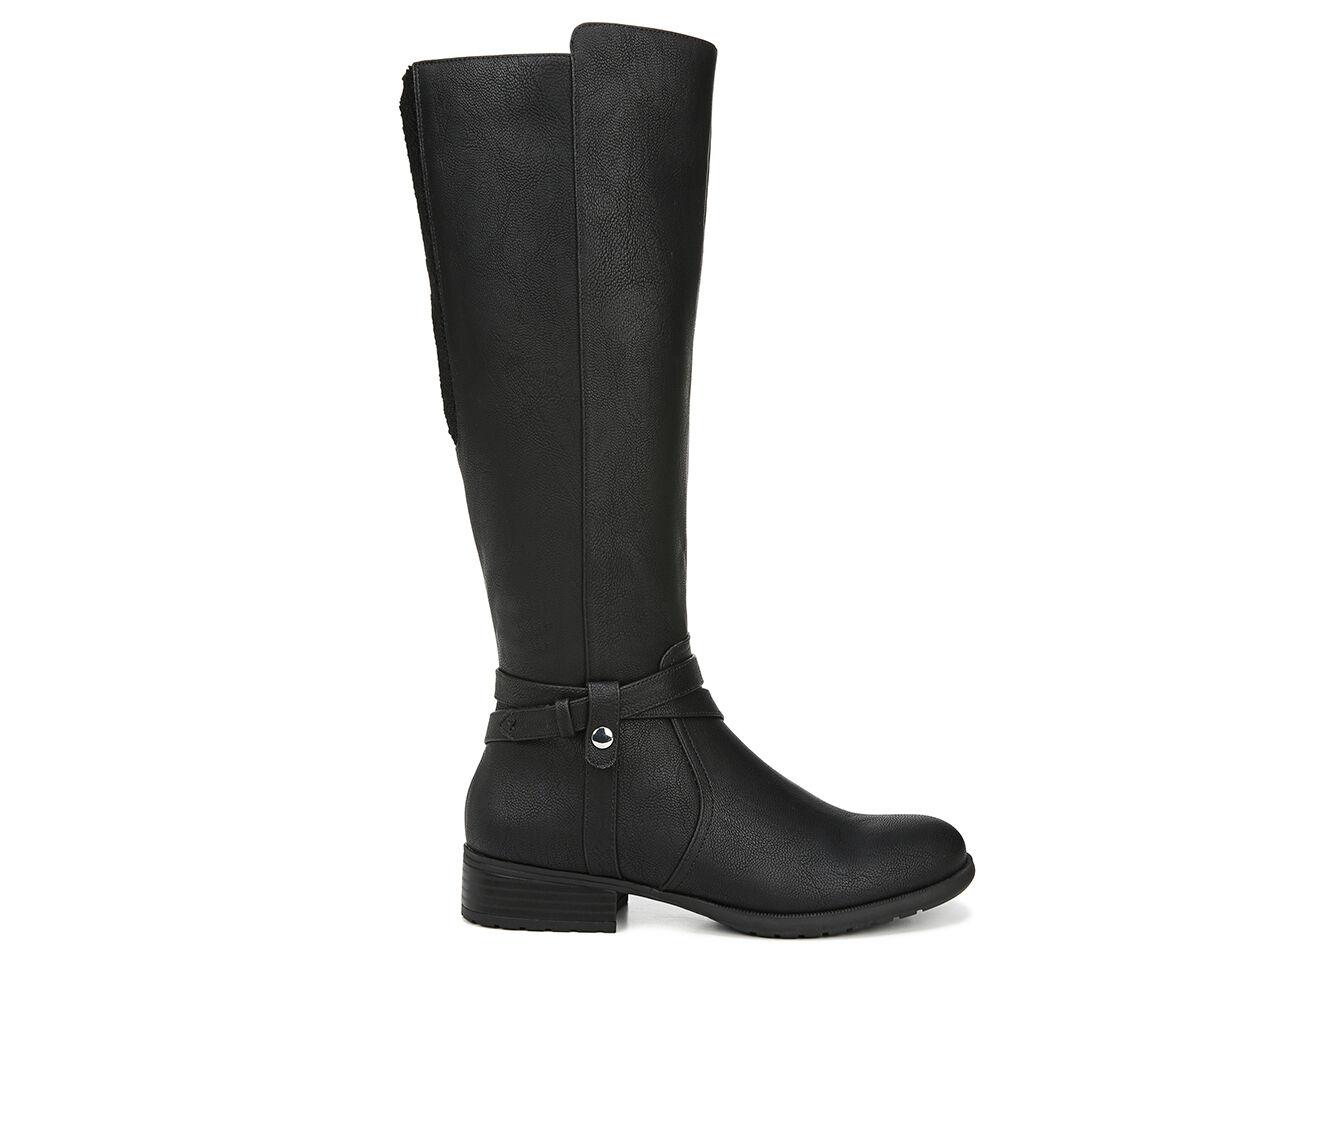 Best Buy Women's LifeStride Xtrovert Wide Calf Riding Boots Black